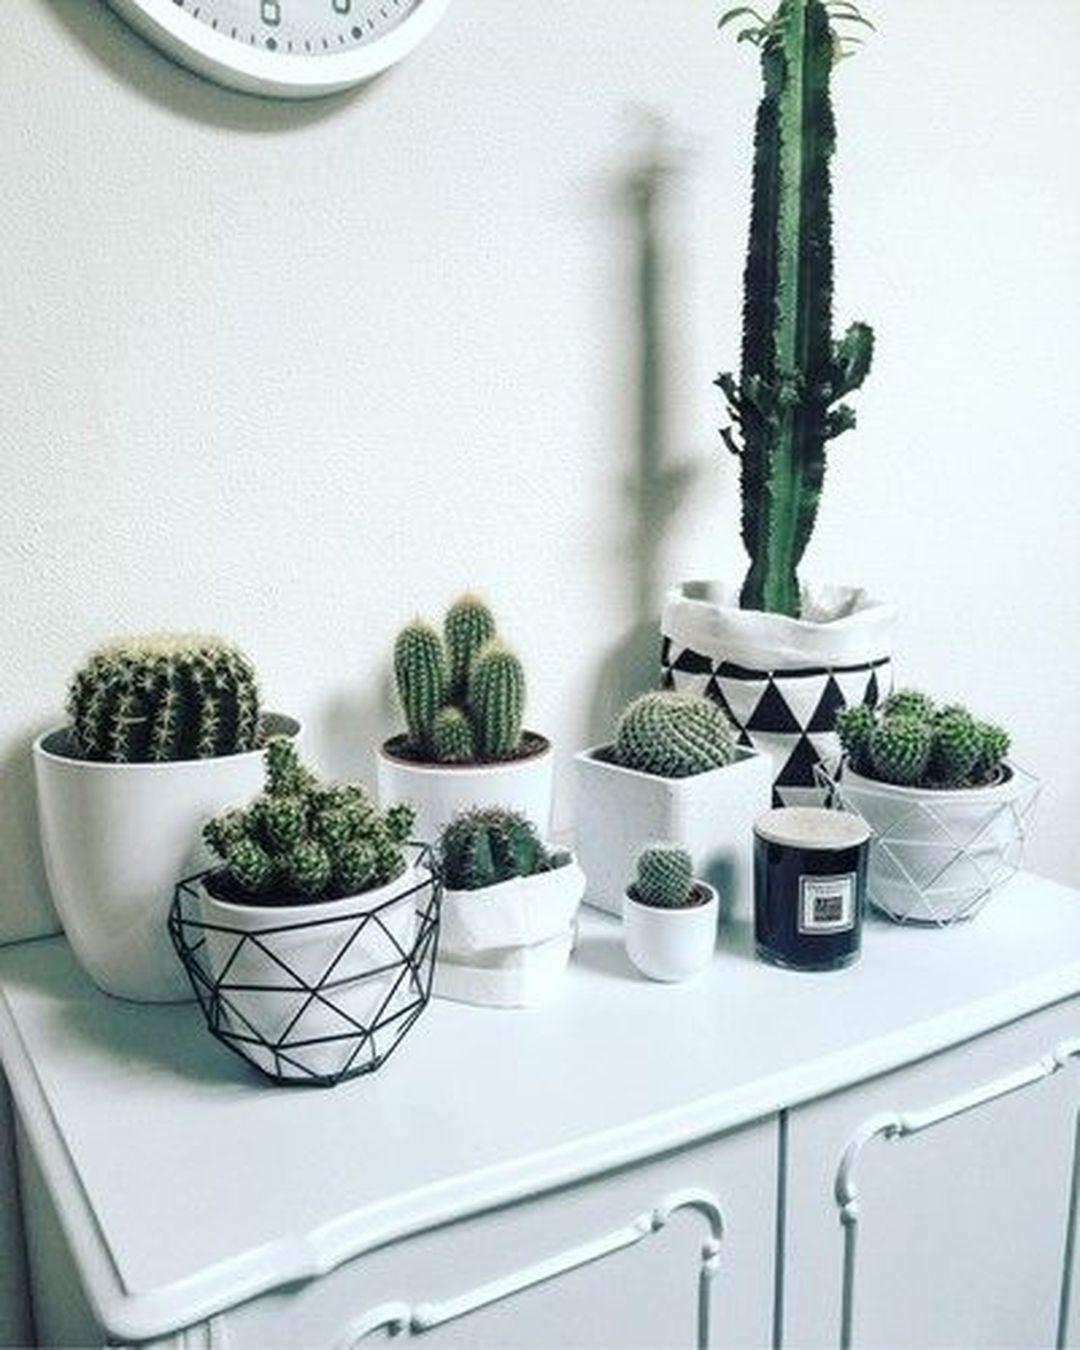 Creative And Beautiful Cactus Room Decor Decomagz Plant Decor Plants Cactus Decor